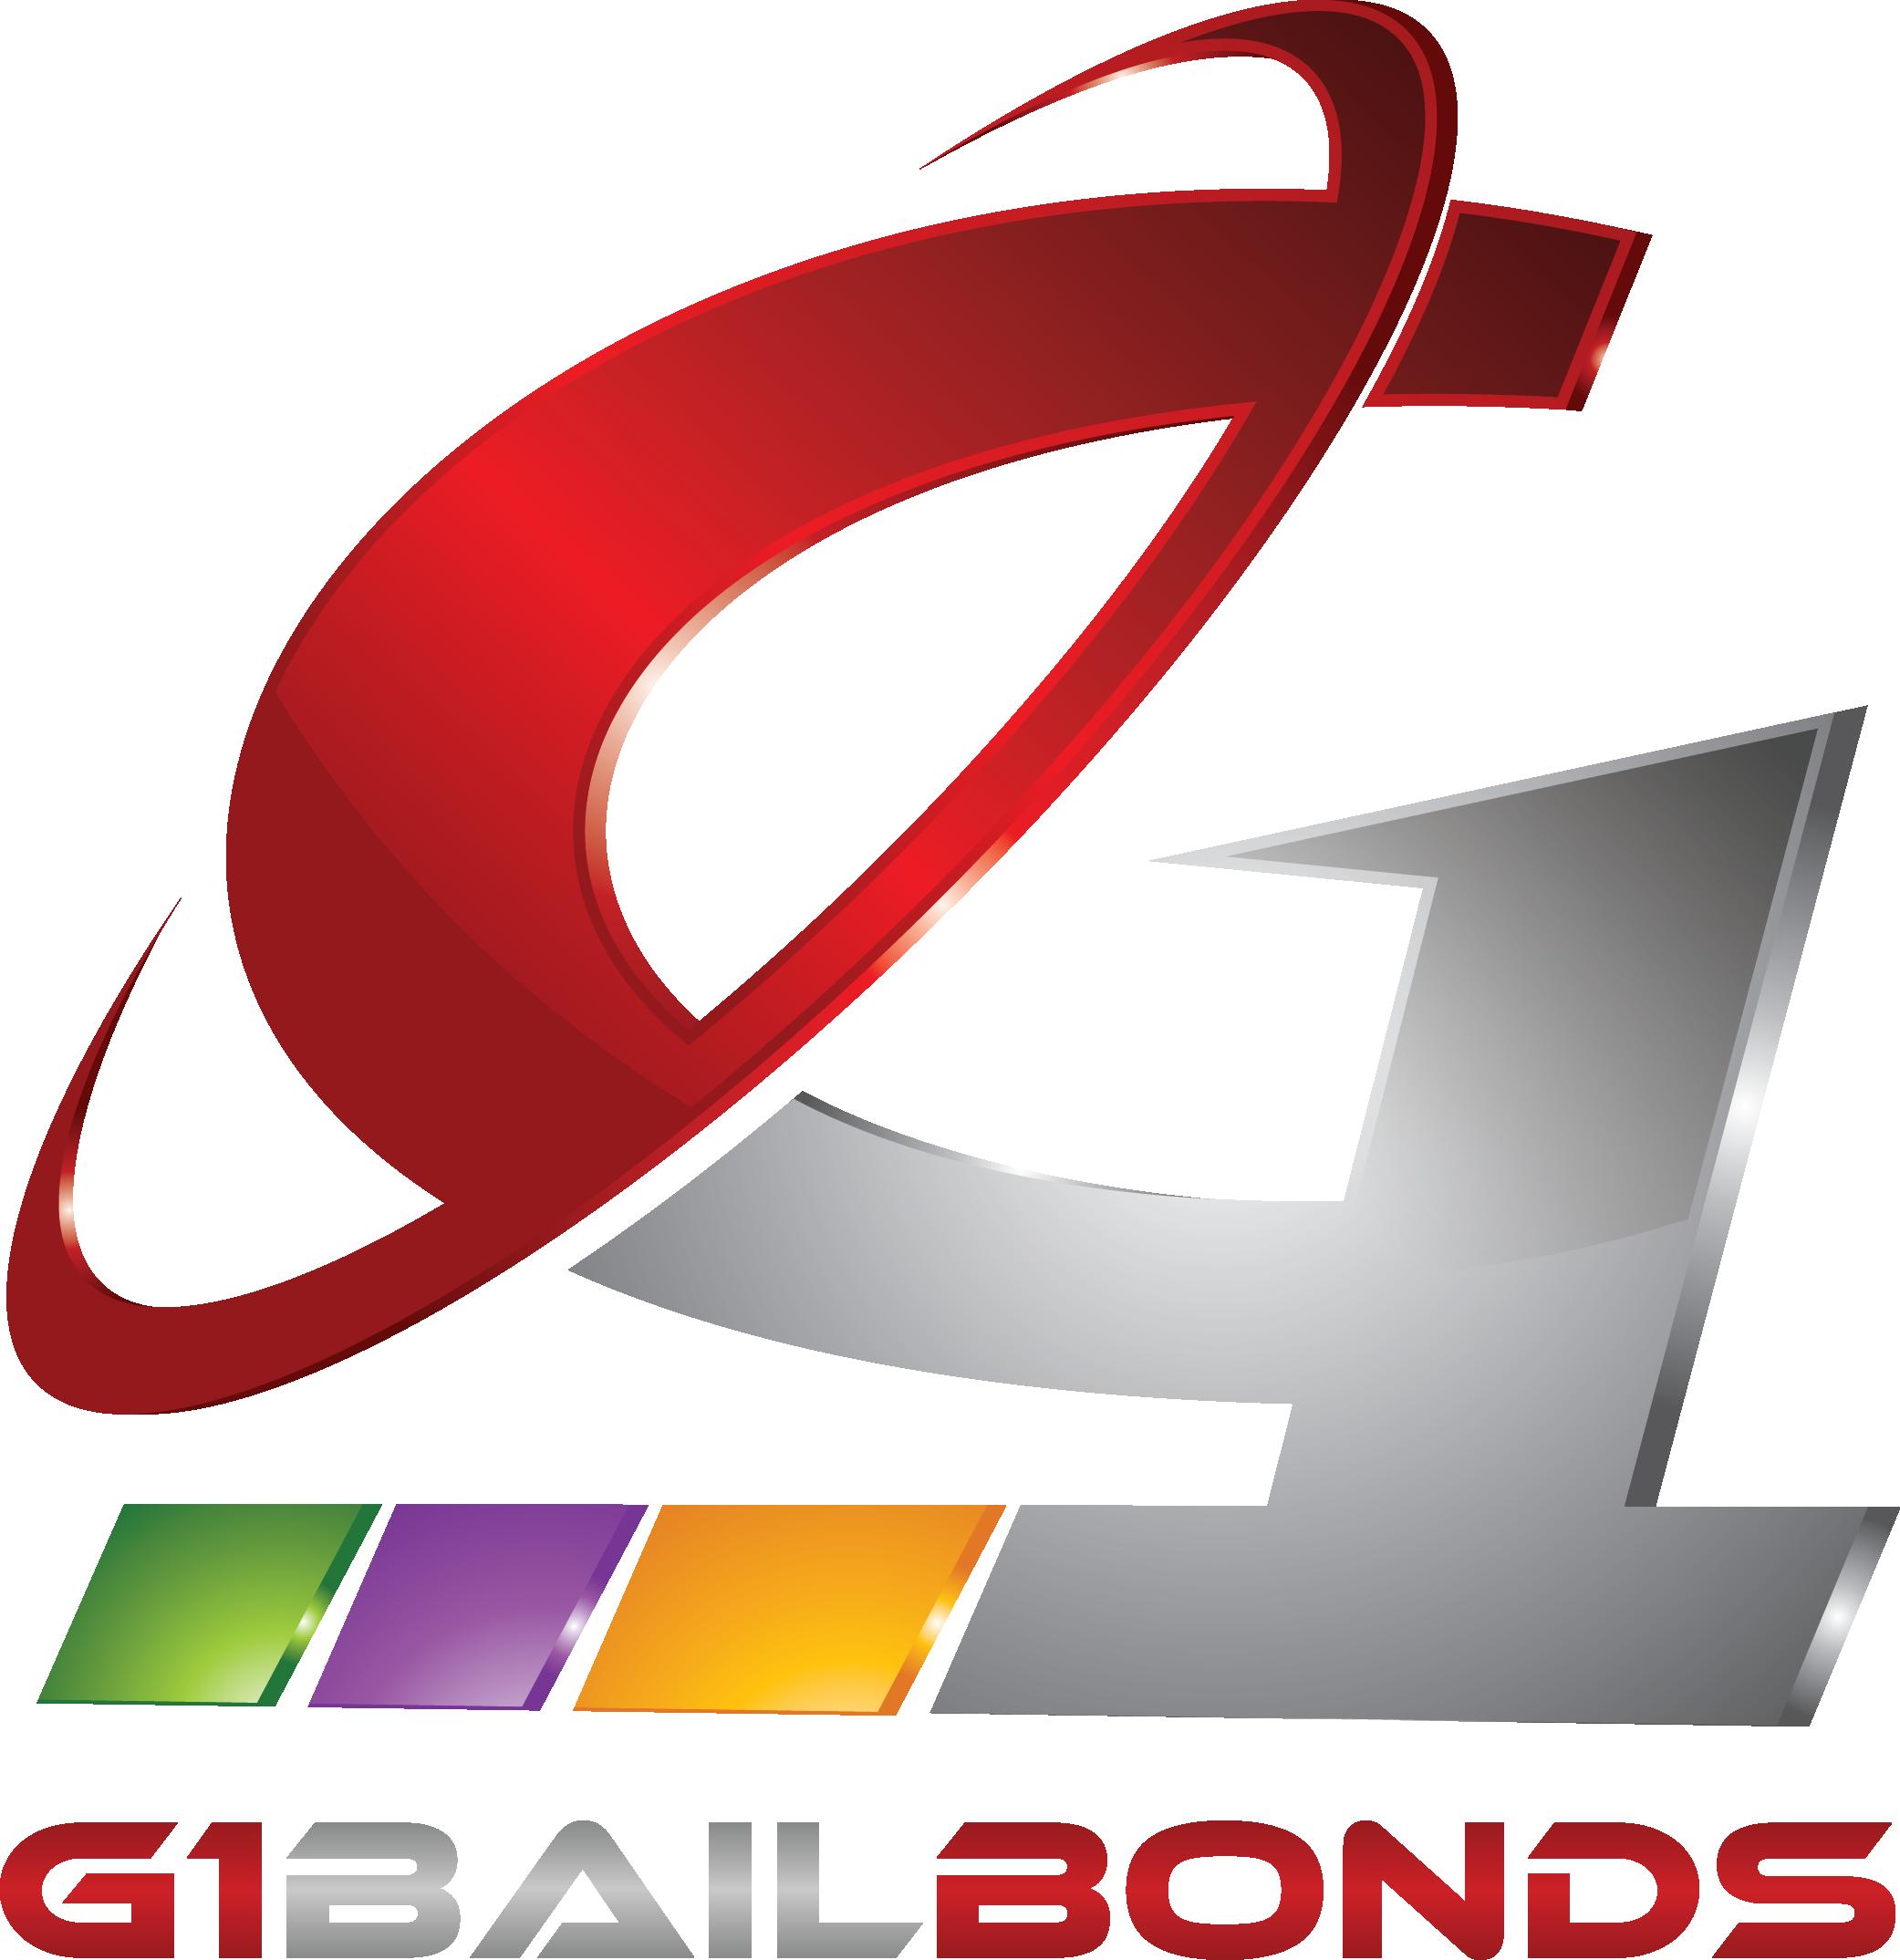 The Bail Bonds Pa Company